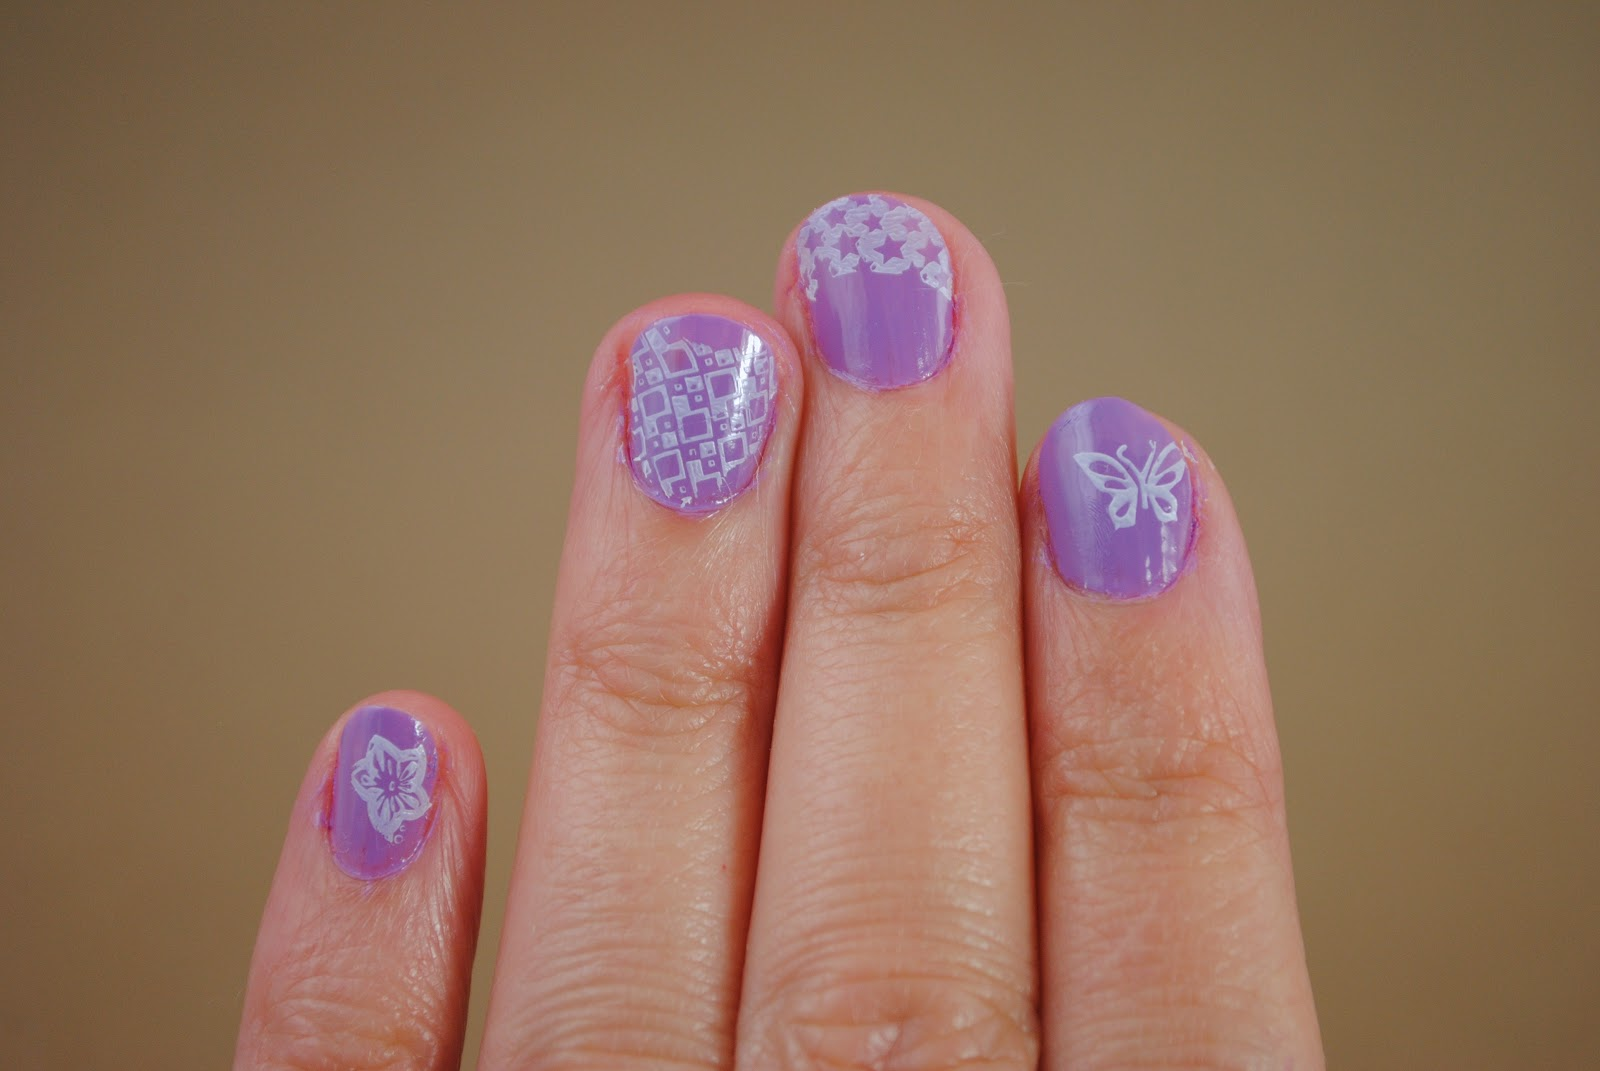 Dana Evans Studio Blog: Nail Stamp Etching- My 15 Minutes of Fame